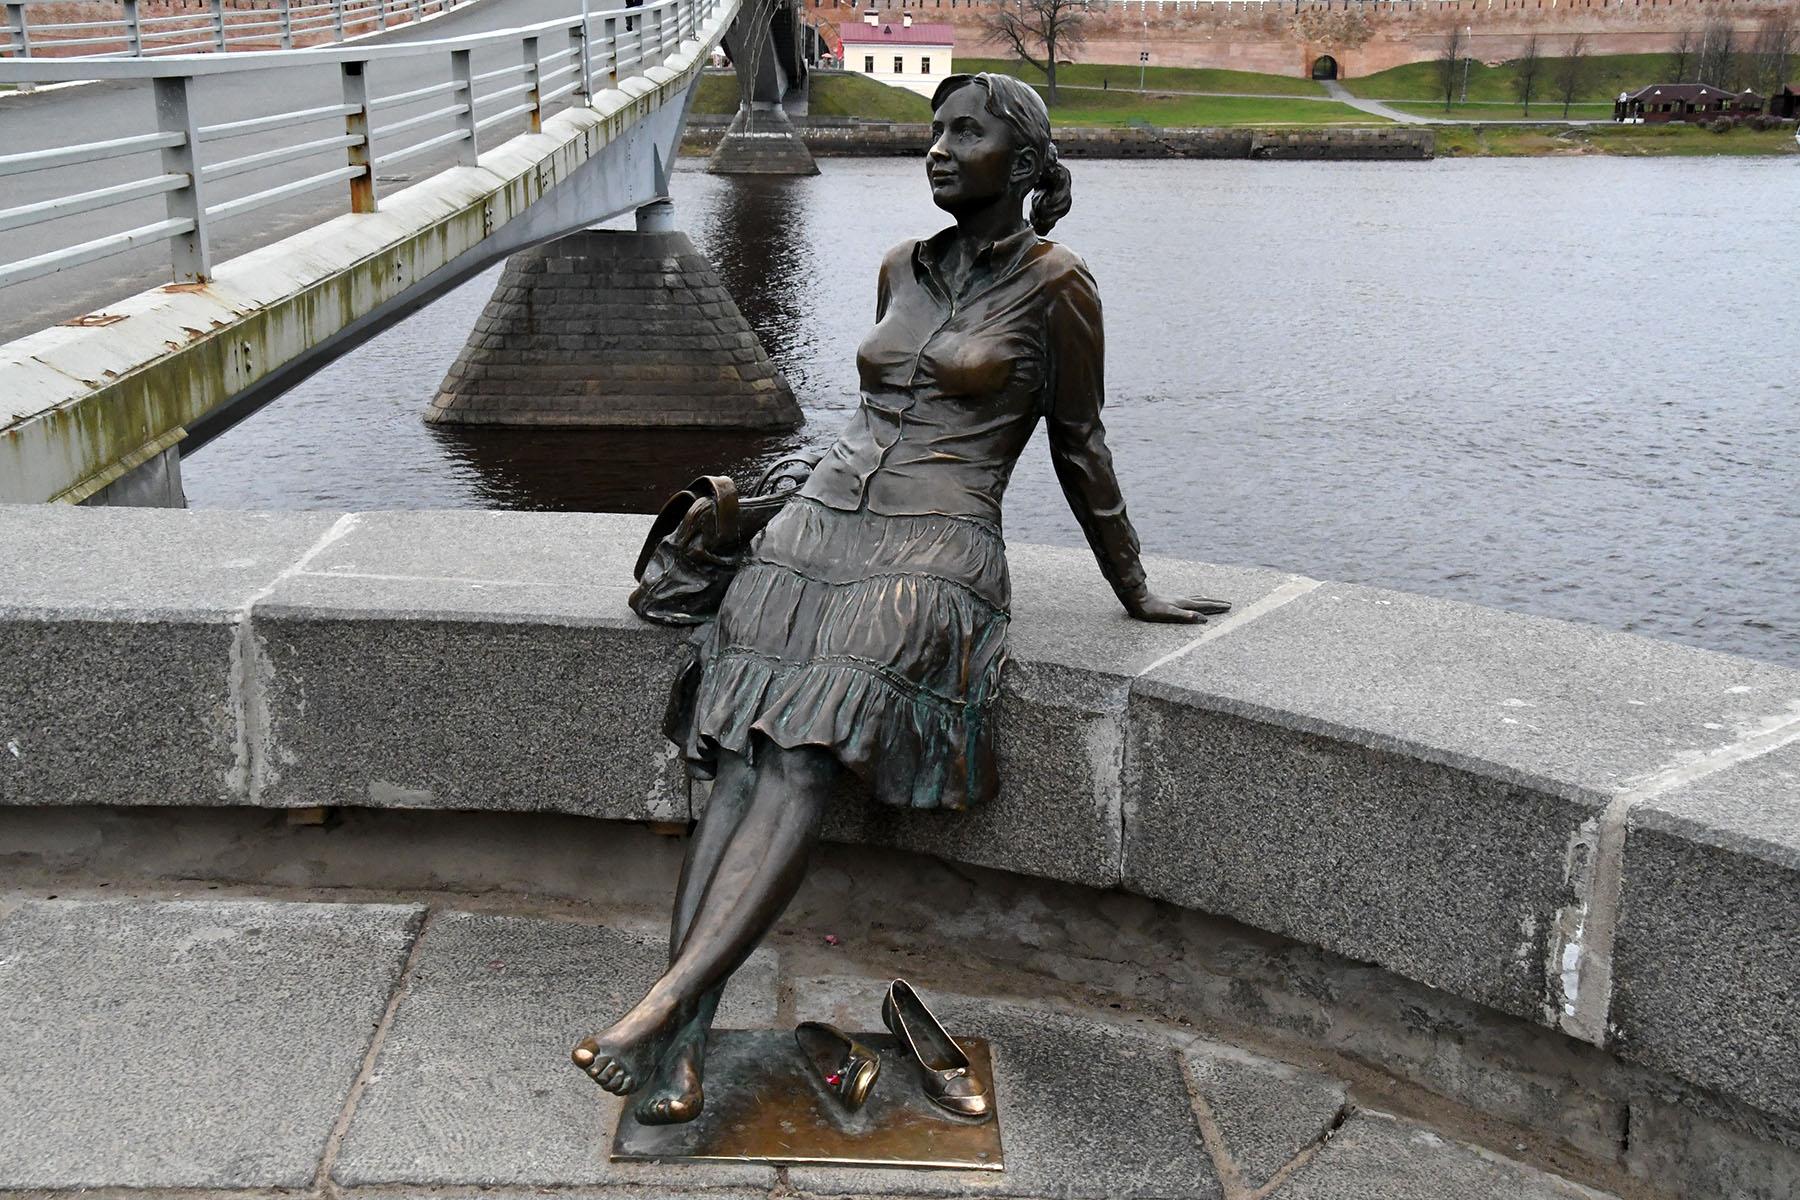 Veliki Novgorodi vihmane sügispäev. Foto Urmas Saard